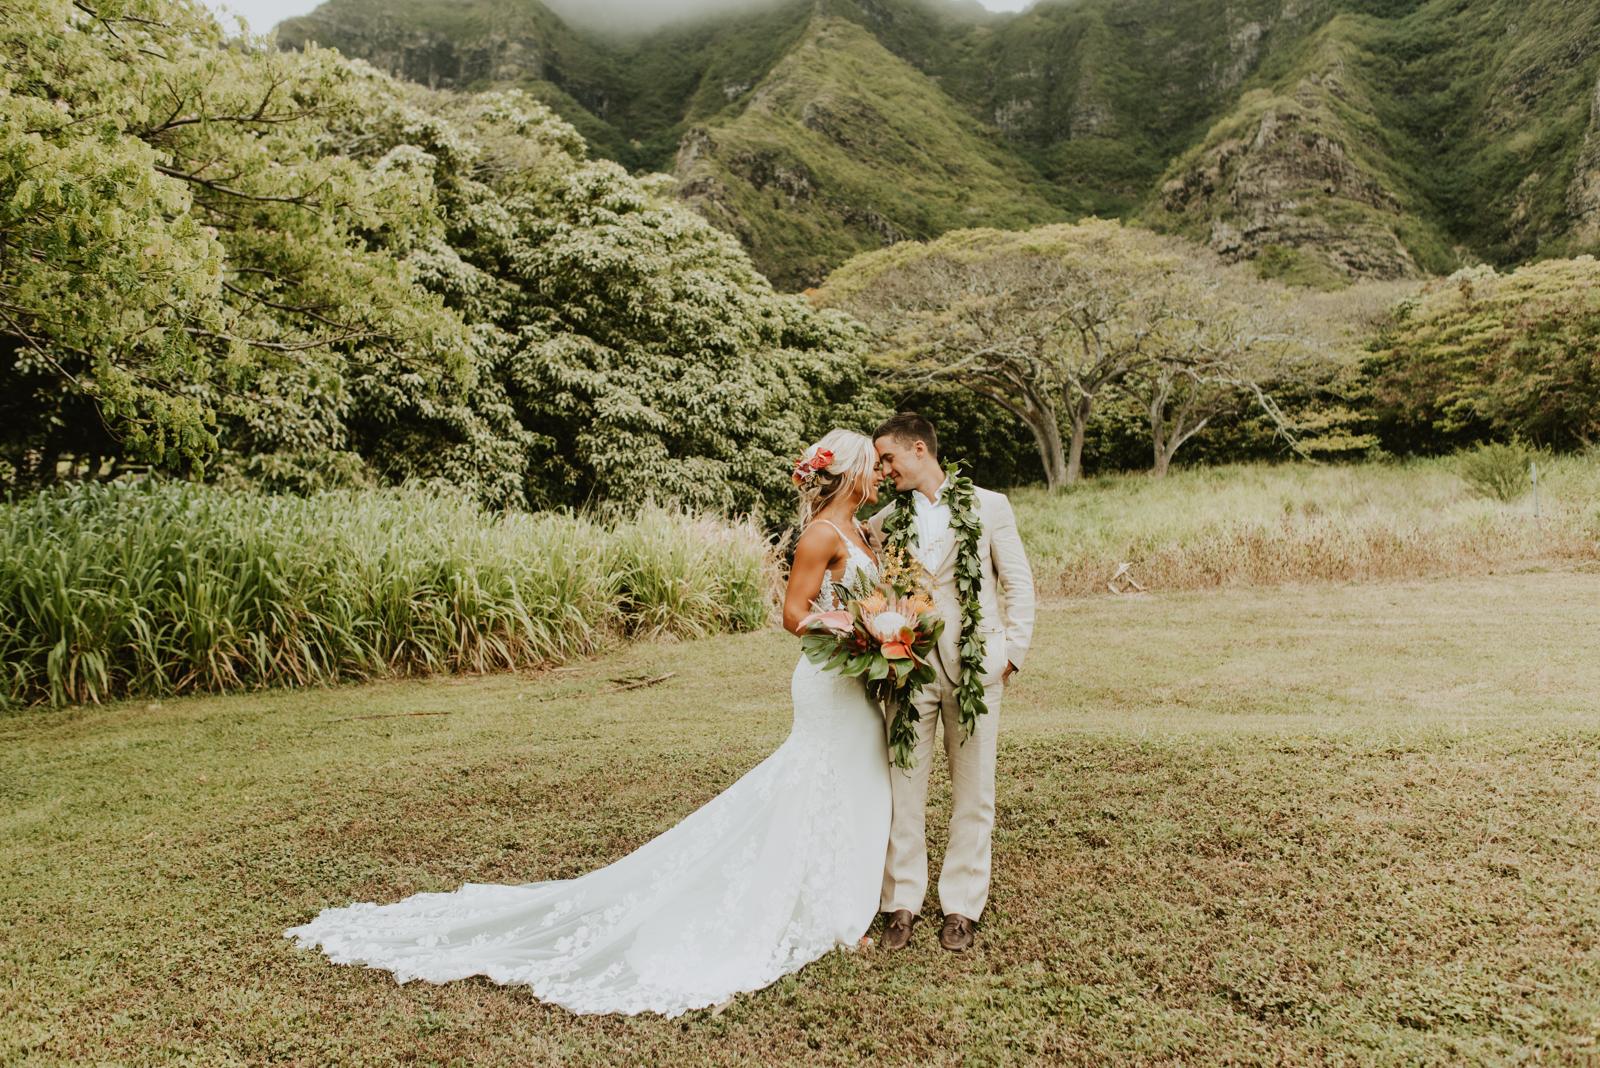 bride and groom at their tropical boho wedding at kualoa ranch in oahu, hawaii